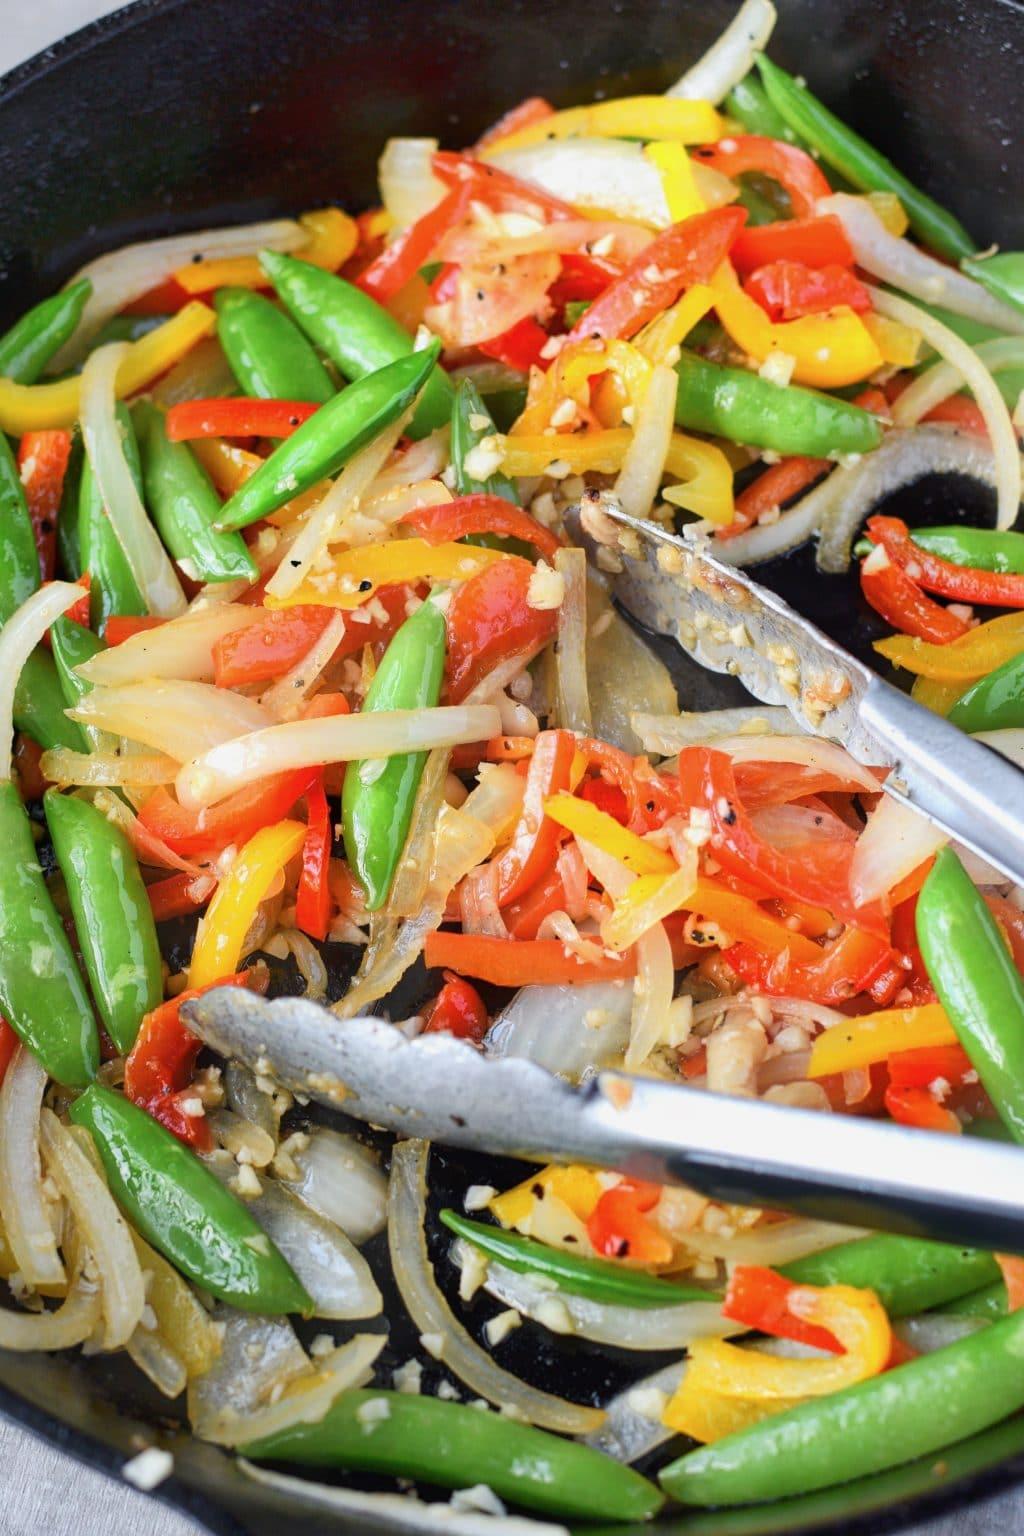 Sweet and Spicy chicken stir fry veggies